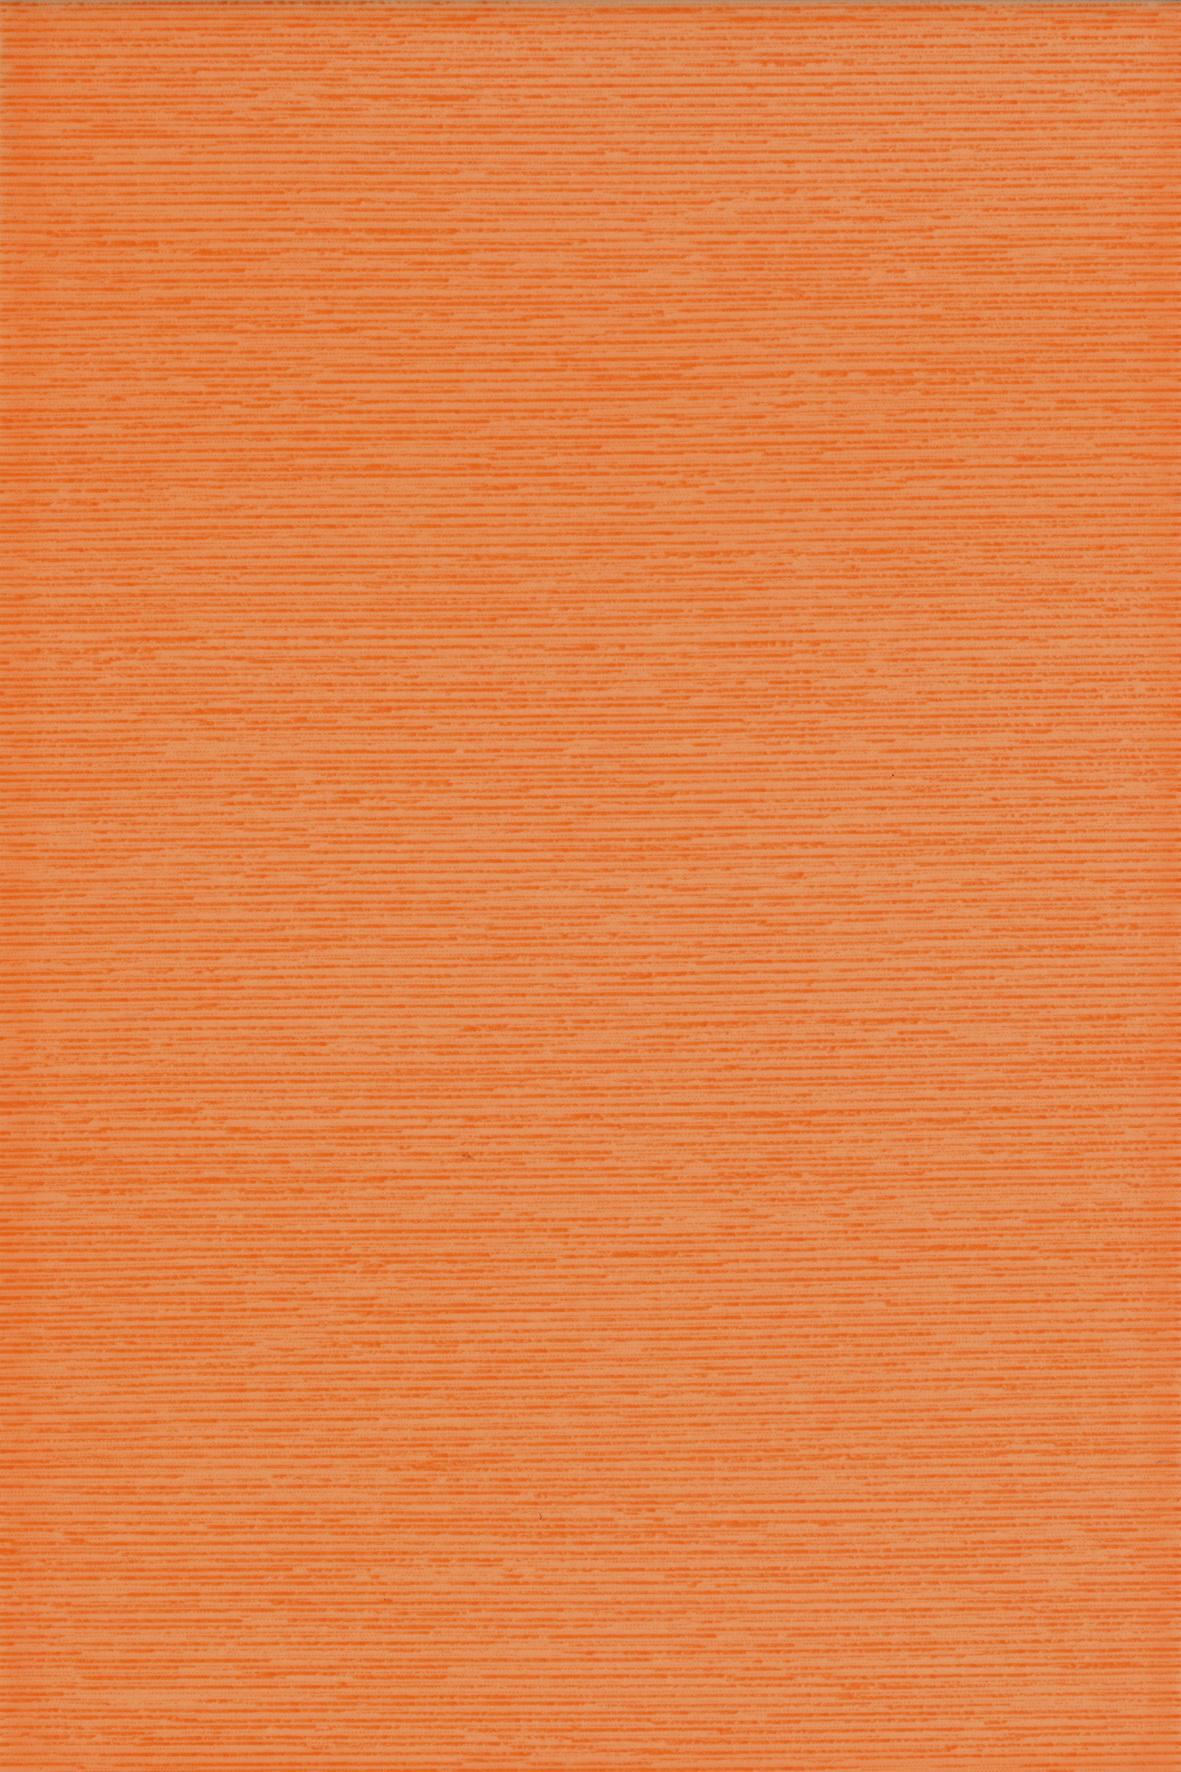 Laura настенная плитка (оранжевая), 20х30